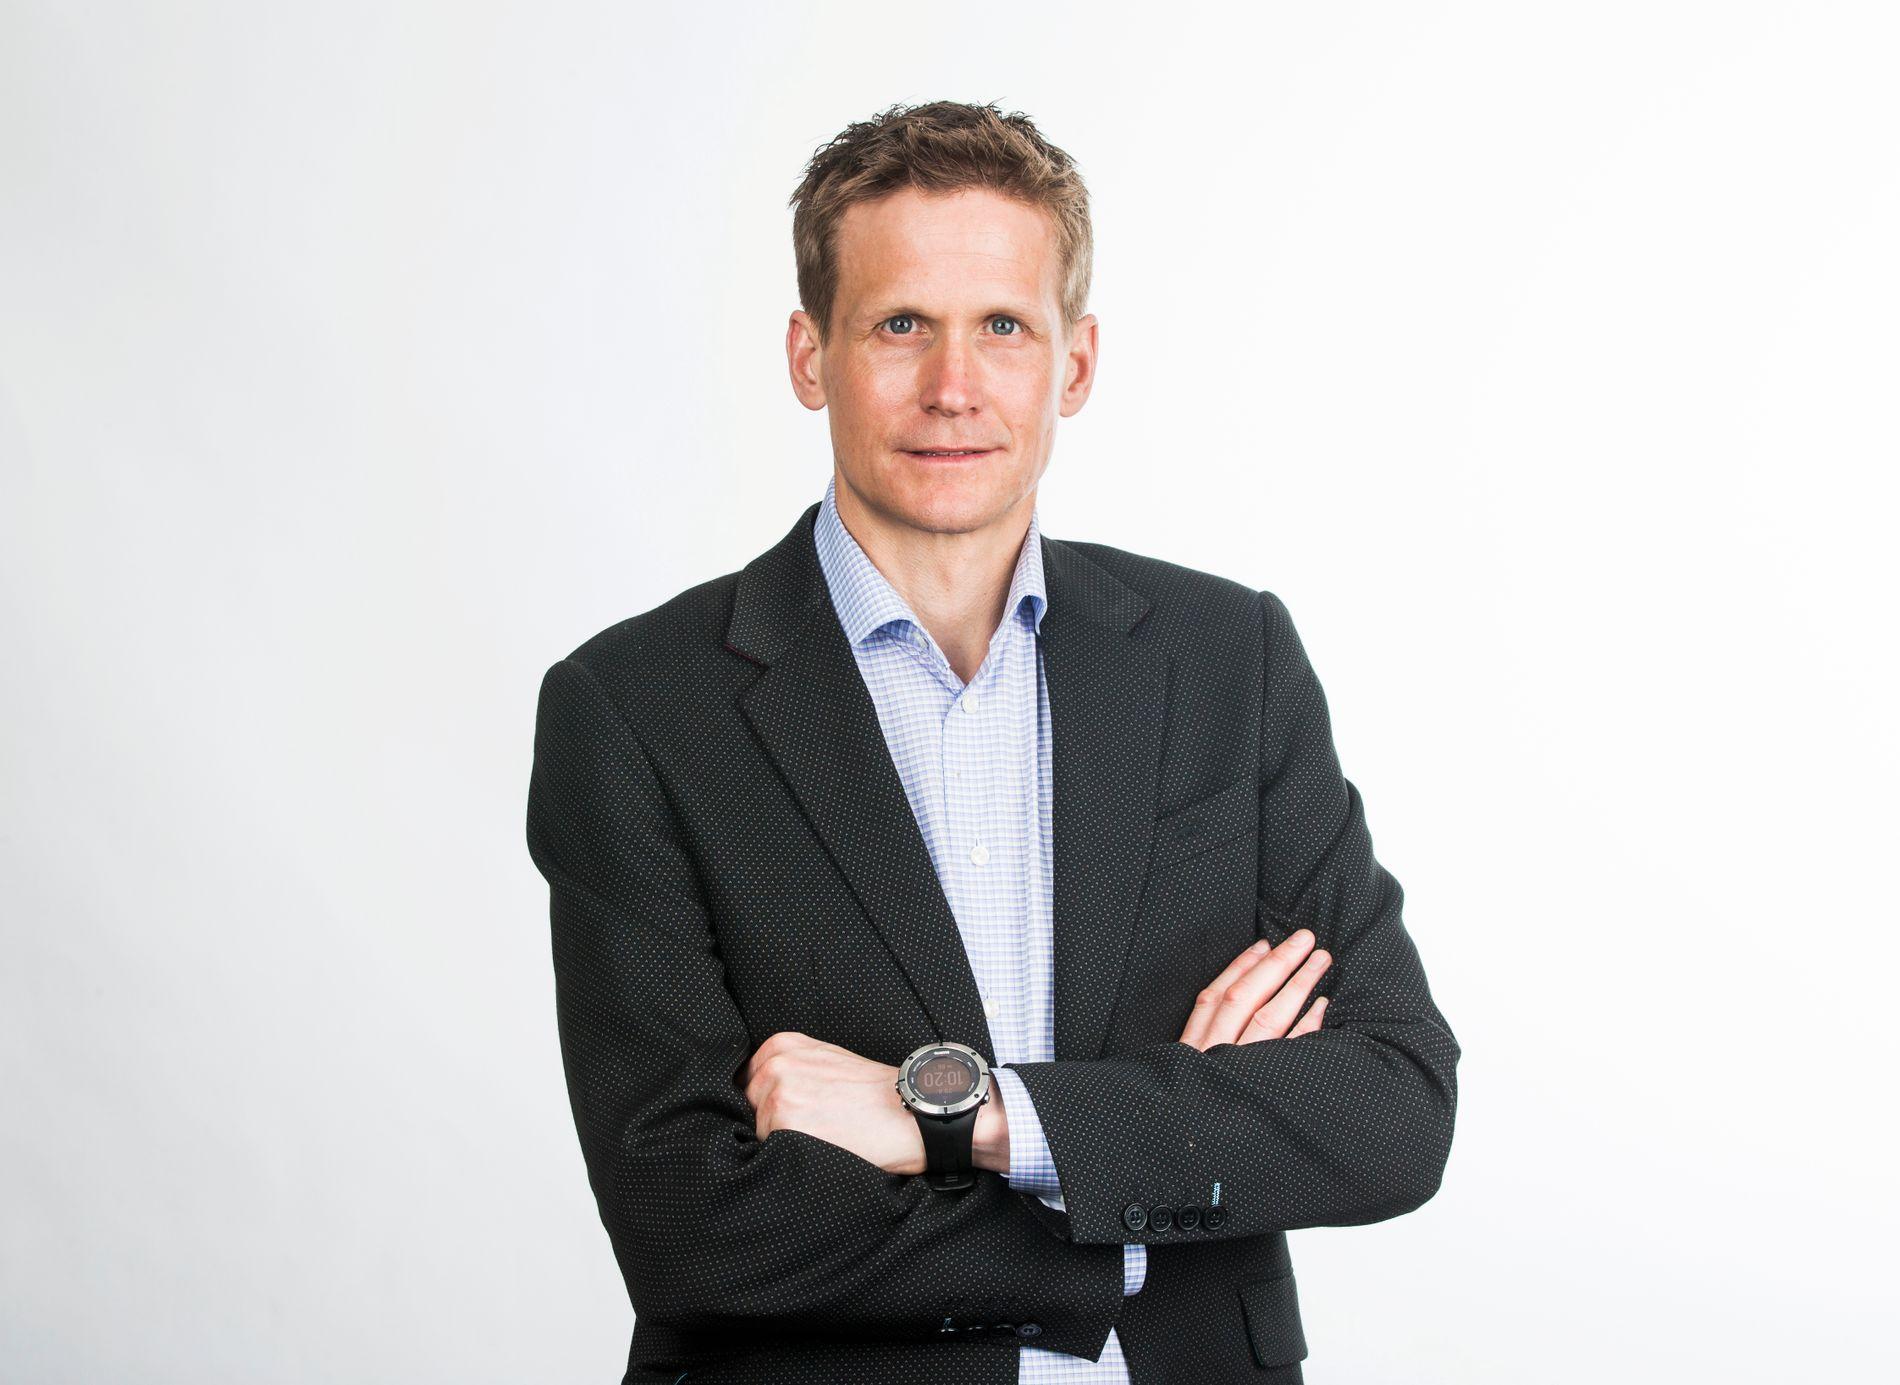 VG-KOMMENTATOR: Leif Welhaven